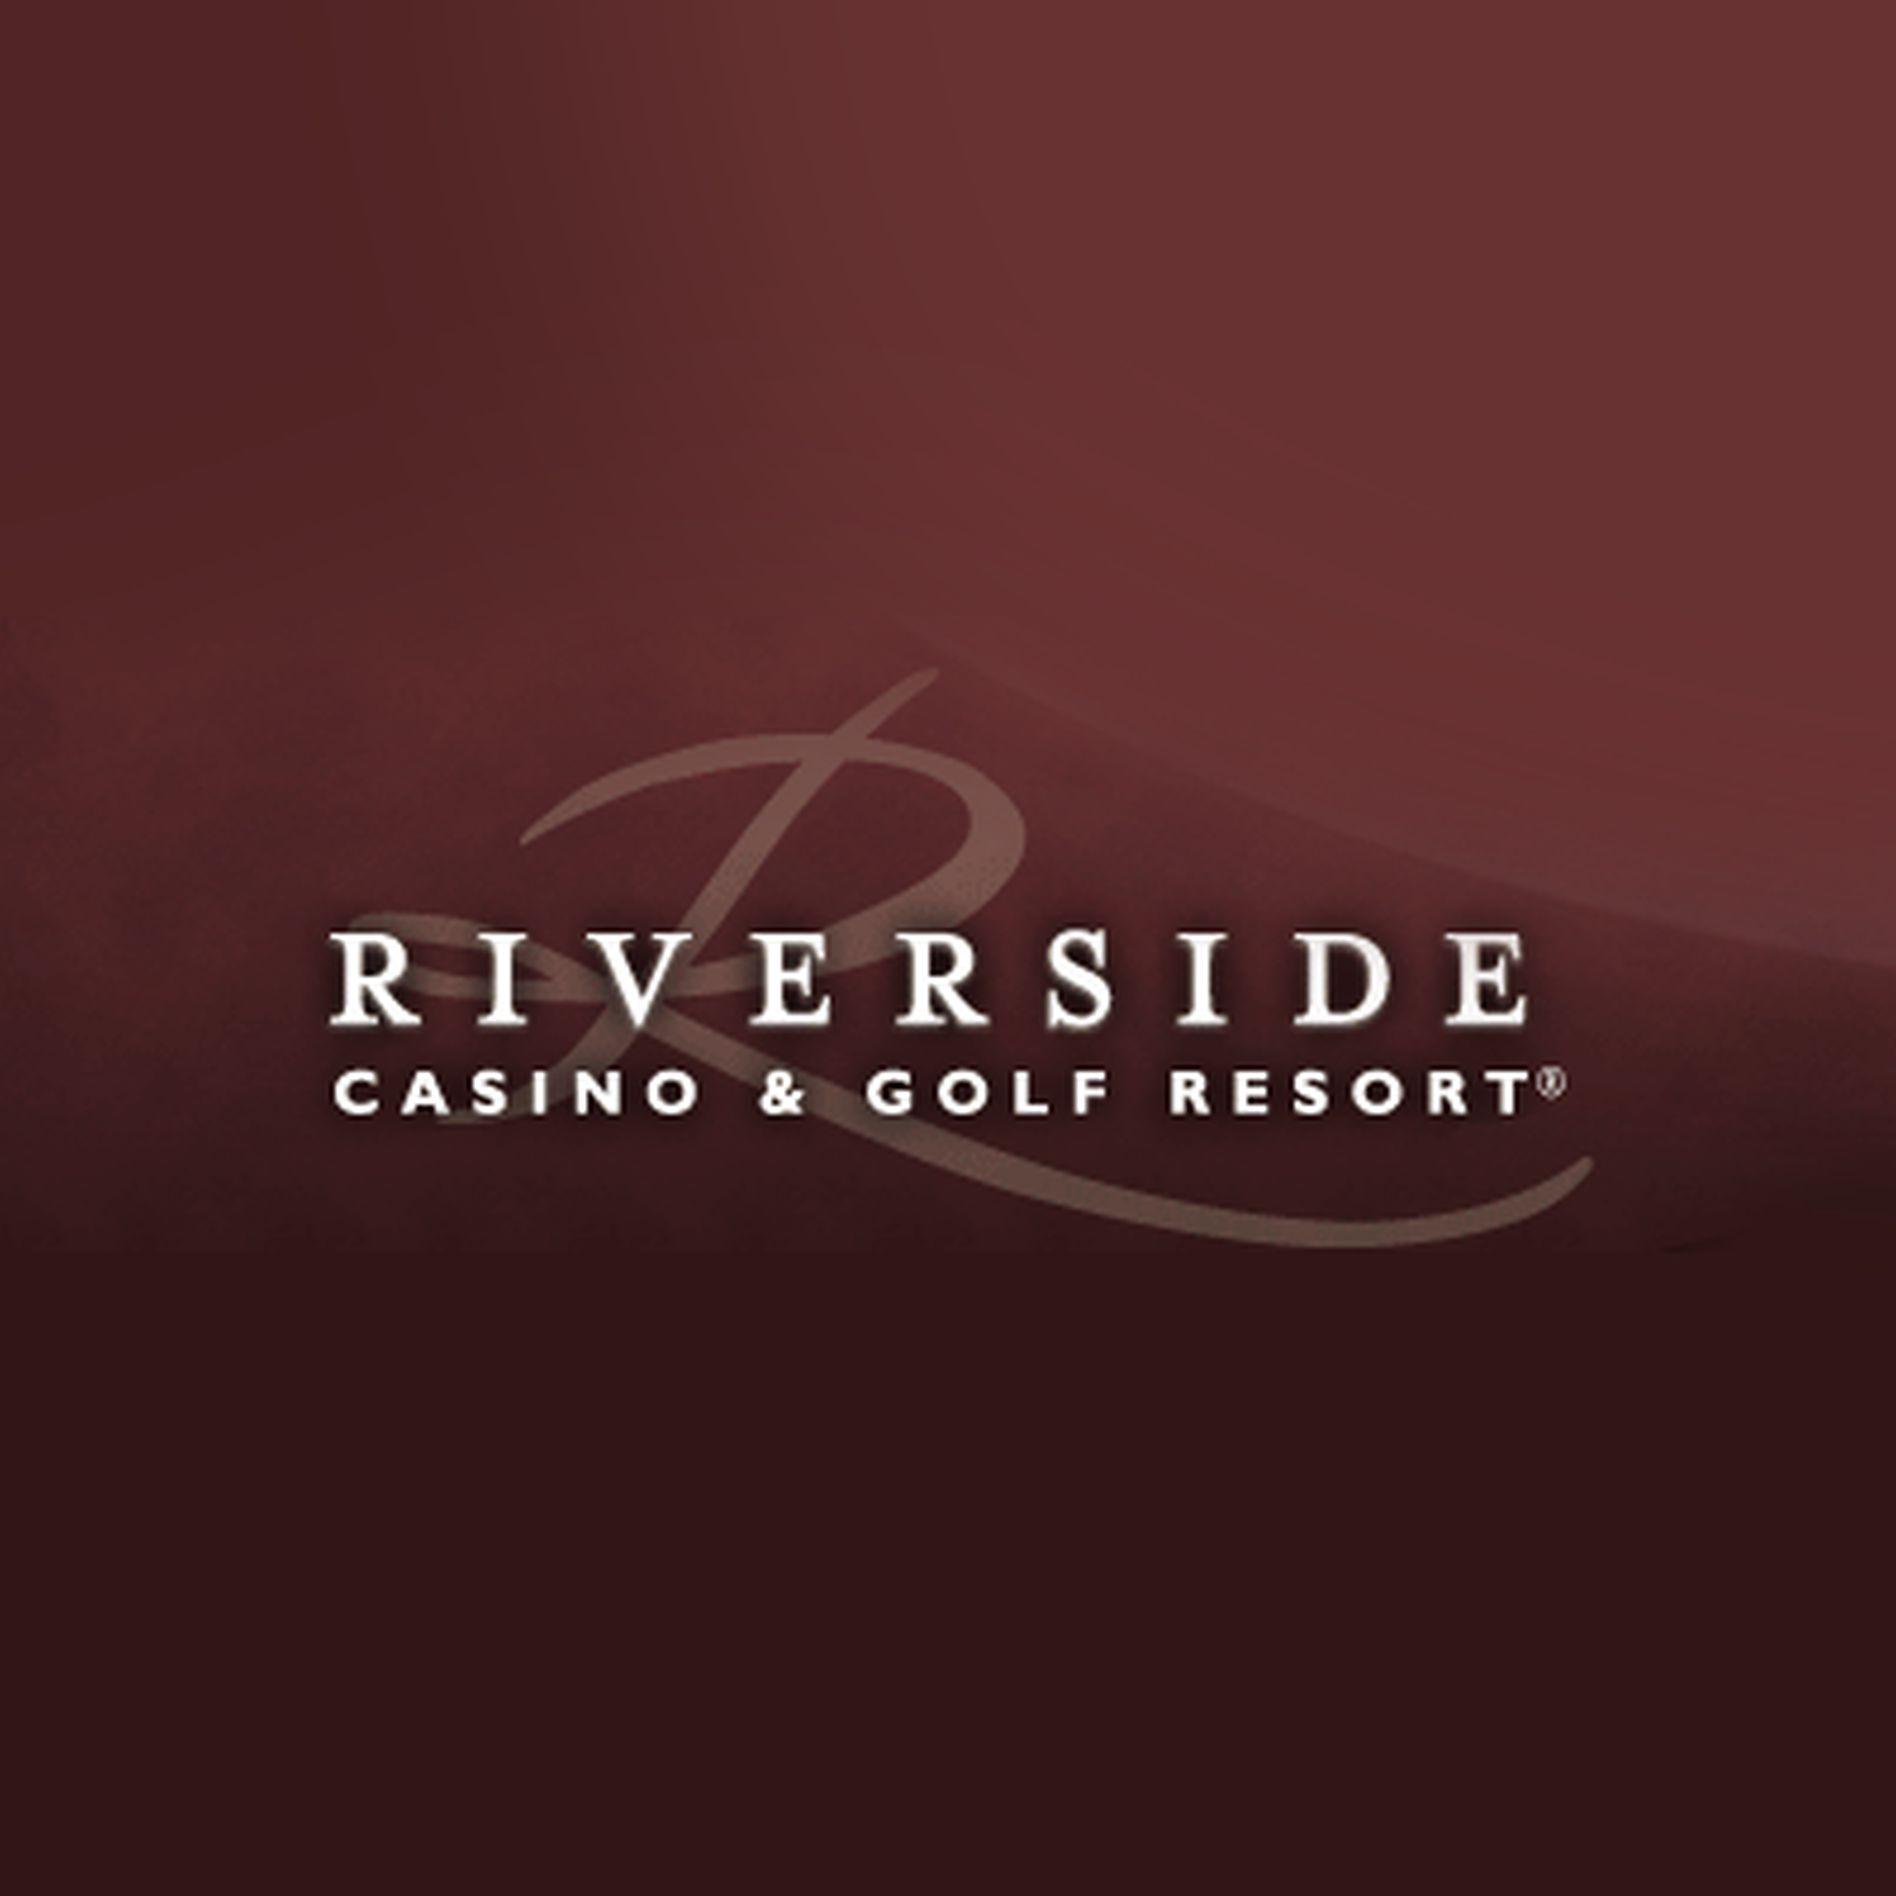 Riverside Casino & Golf Resort, Riverside IA